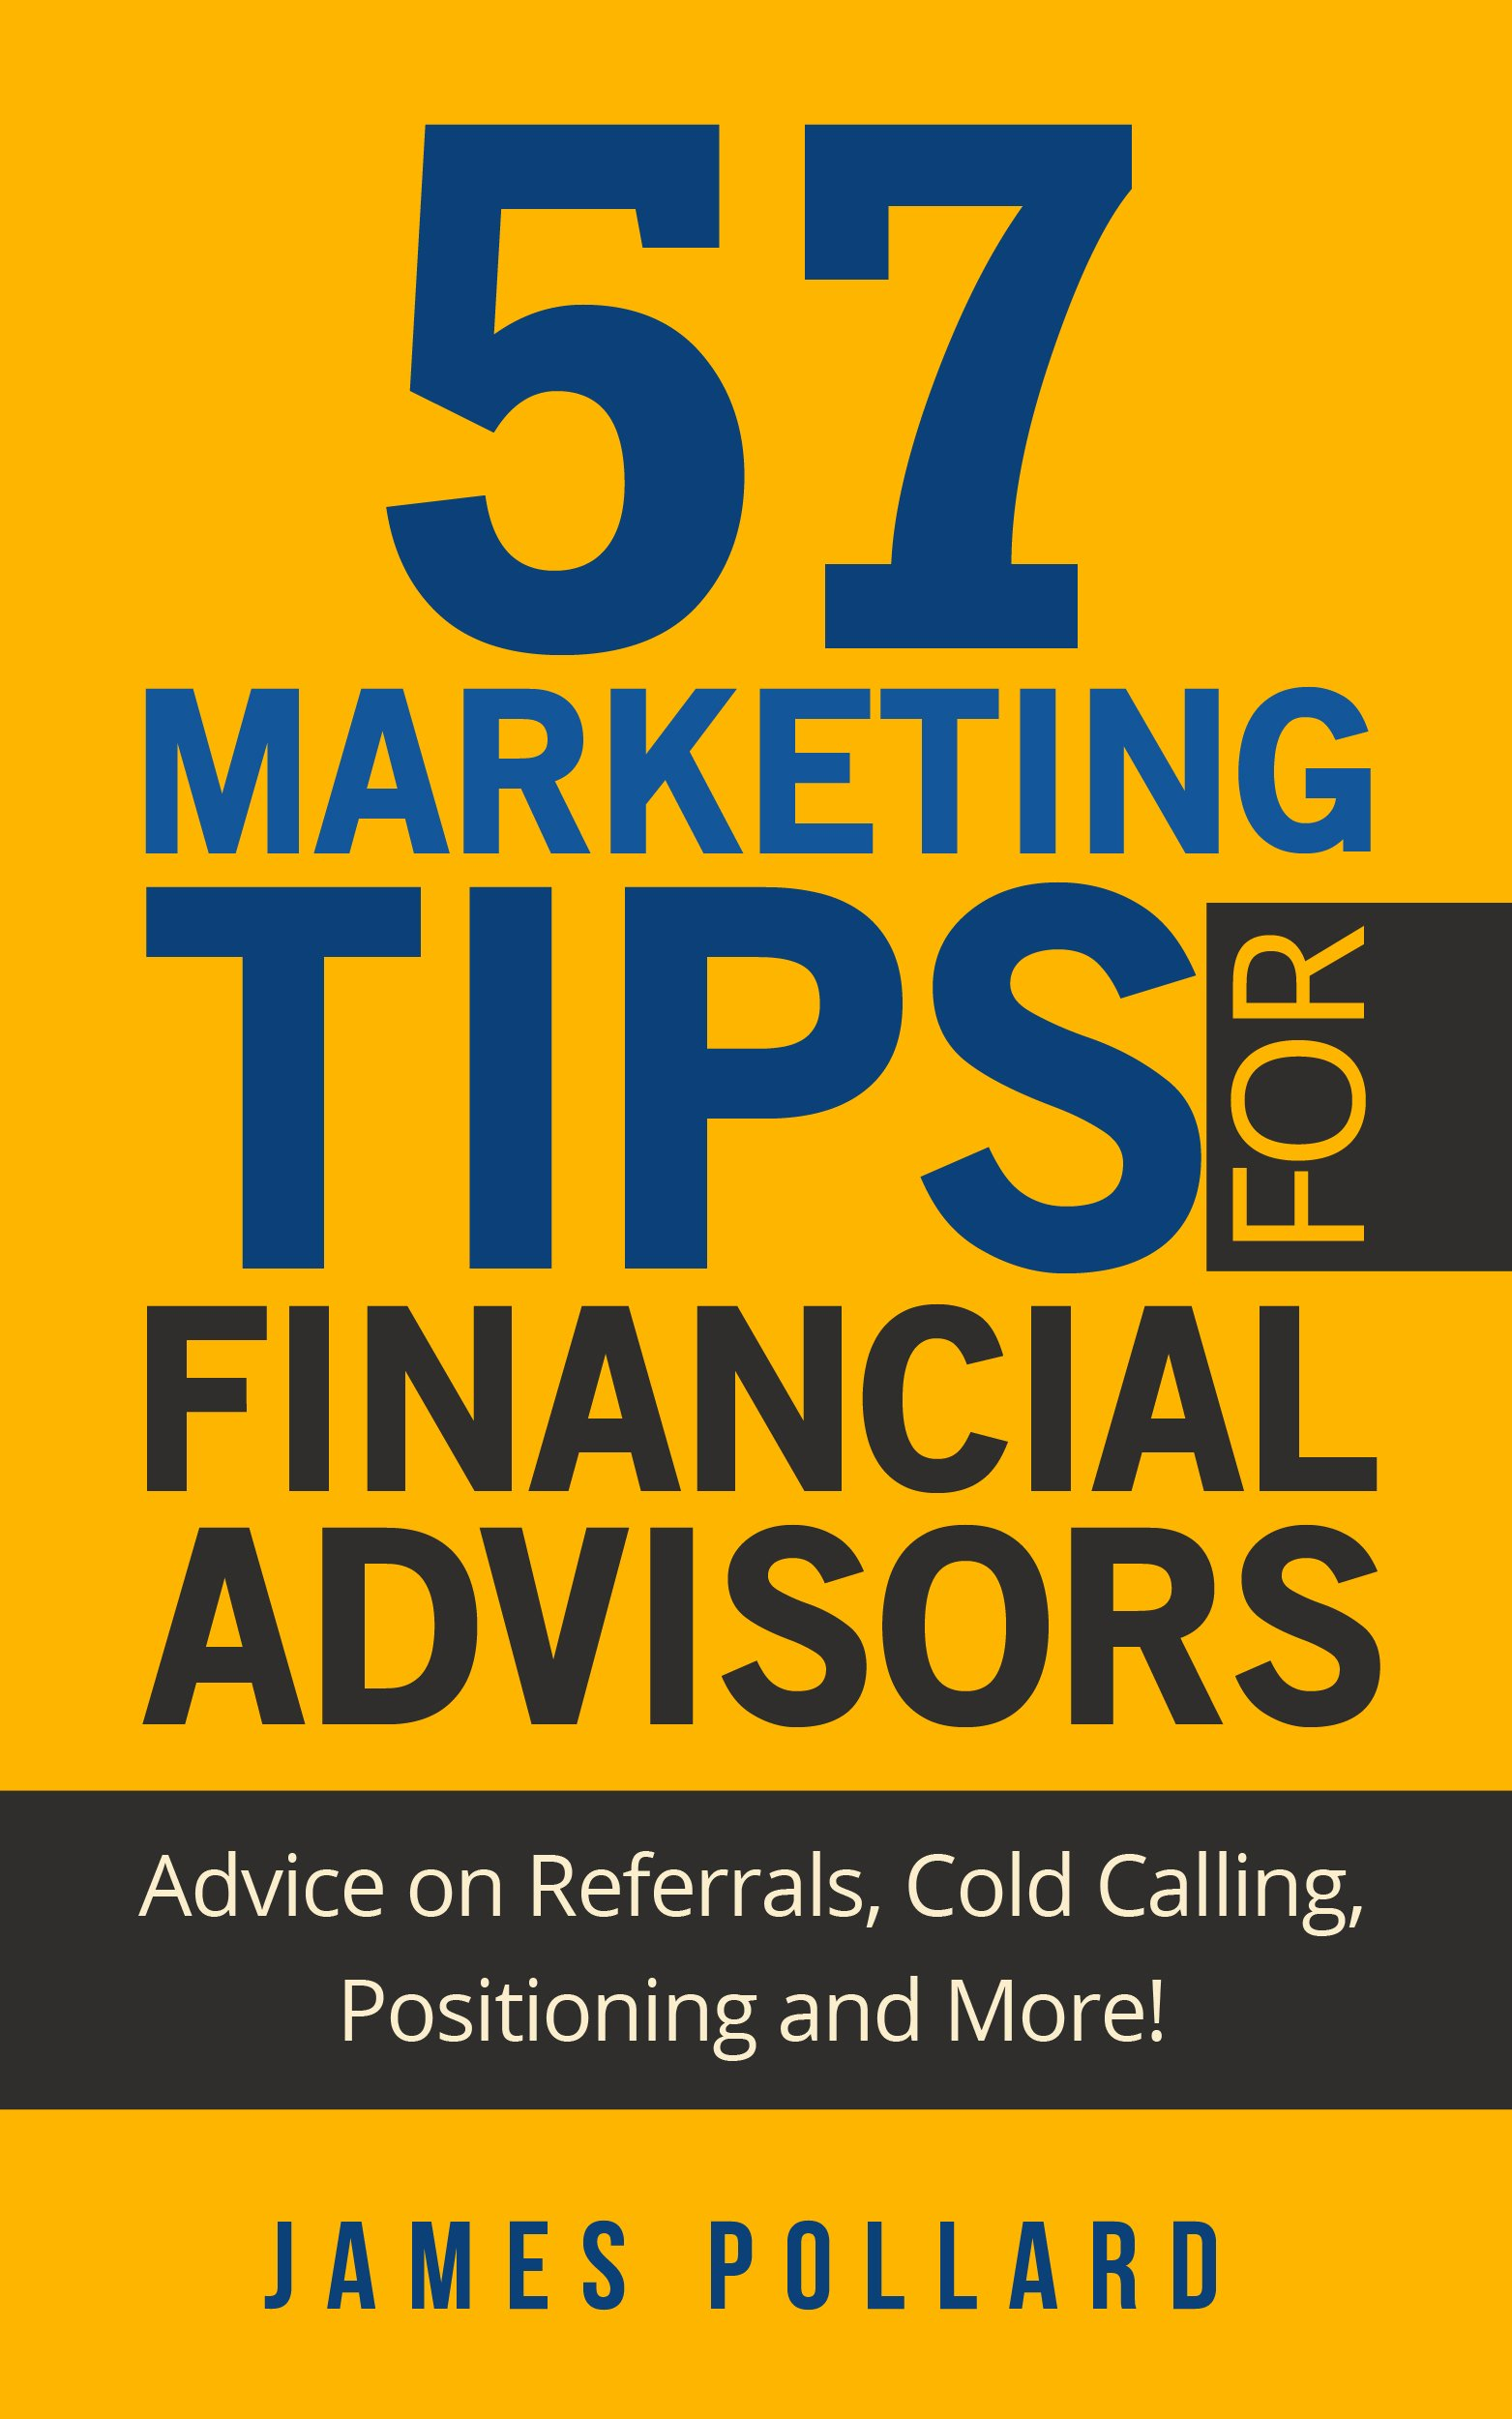 27 financial advisor marketing ideas strategies that work